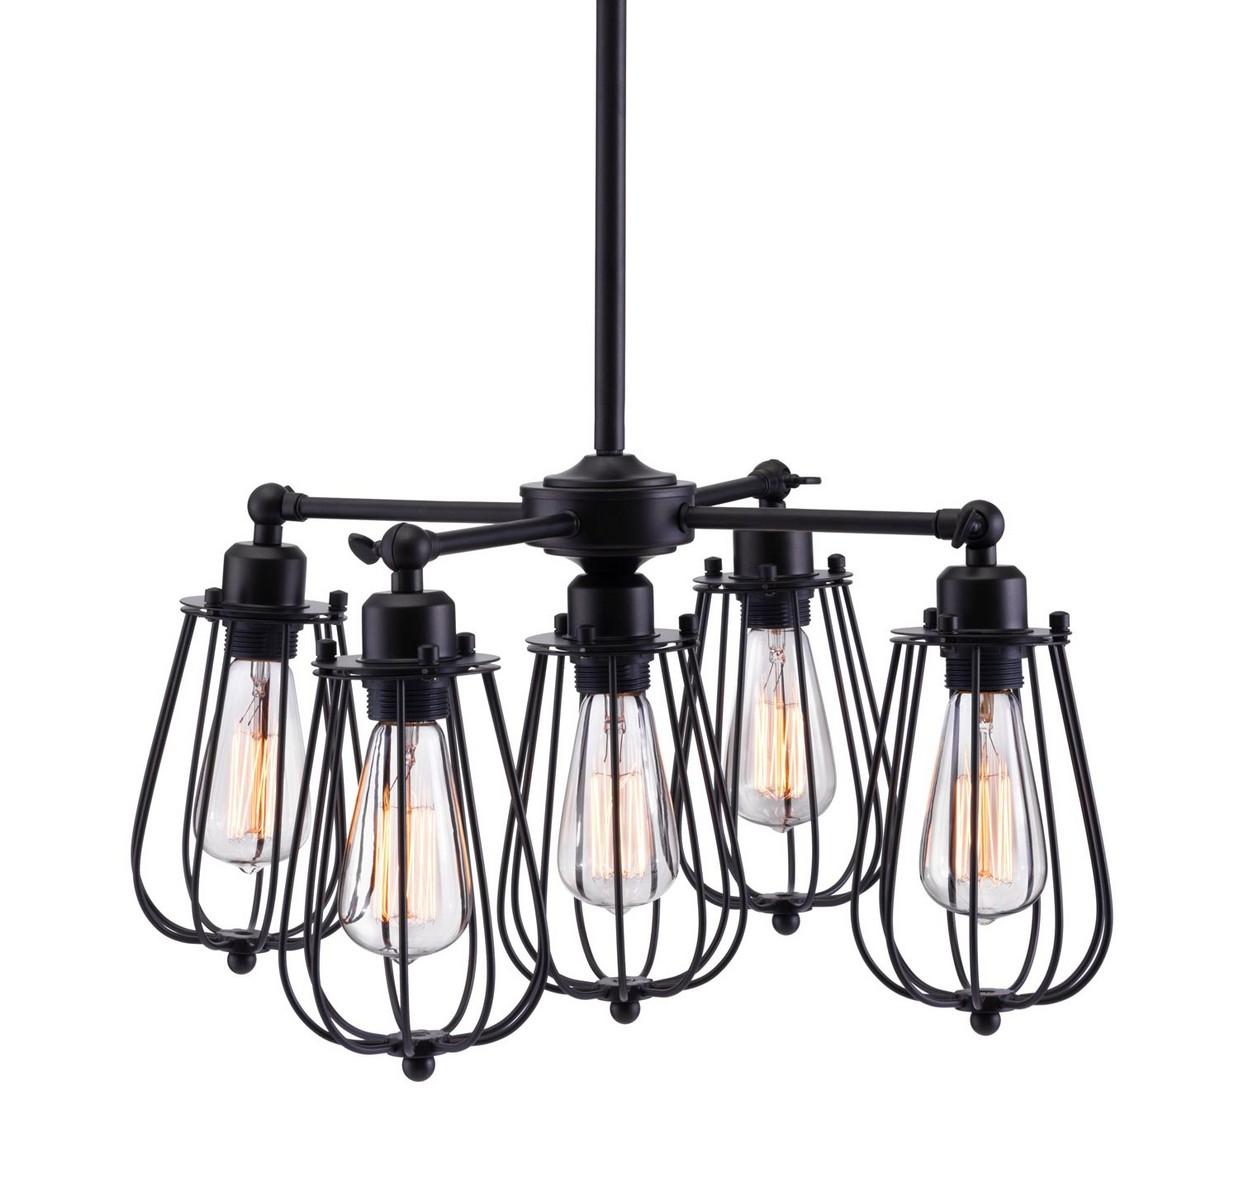 Zuo Modern Porirua Ceiling Lamp - Distressed Black